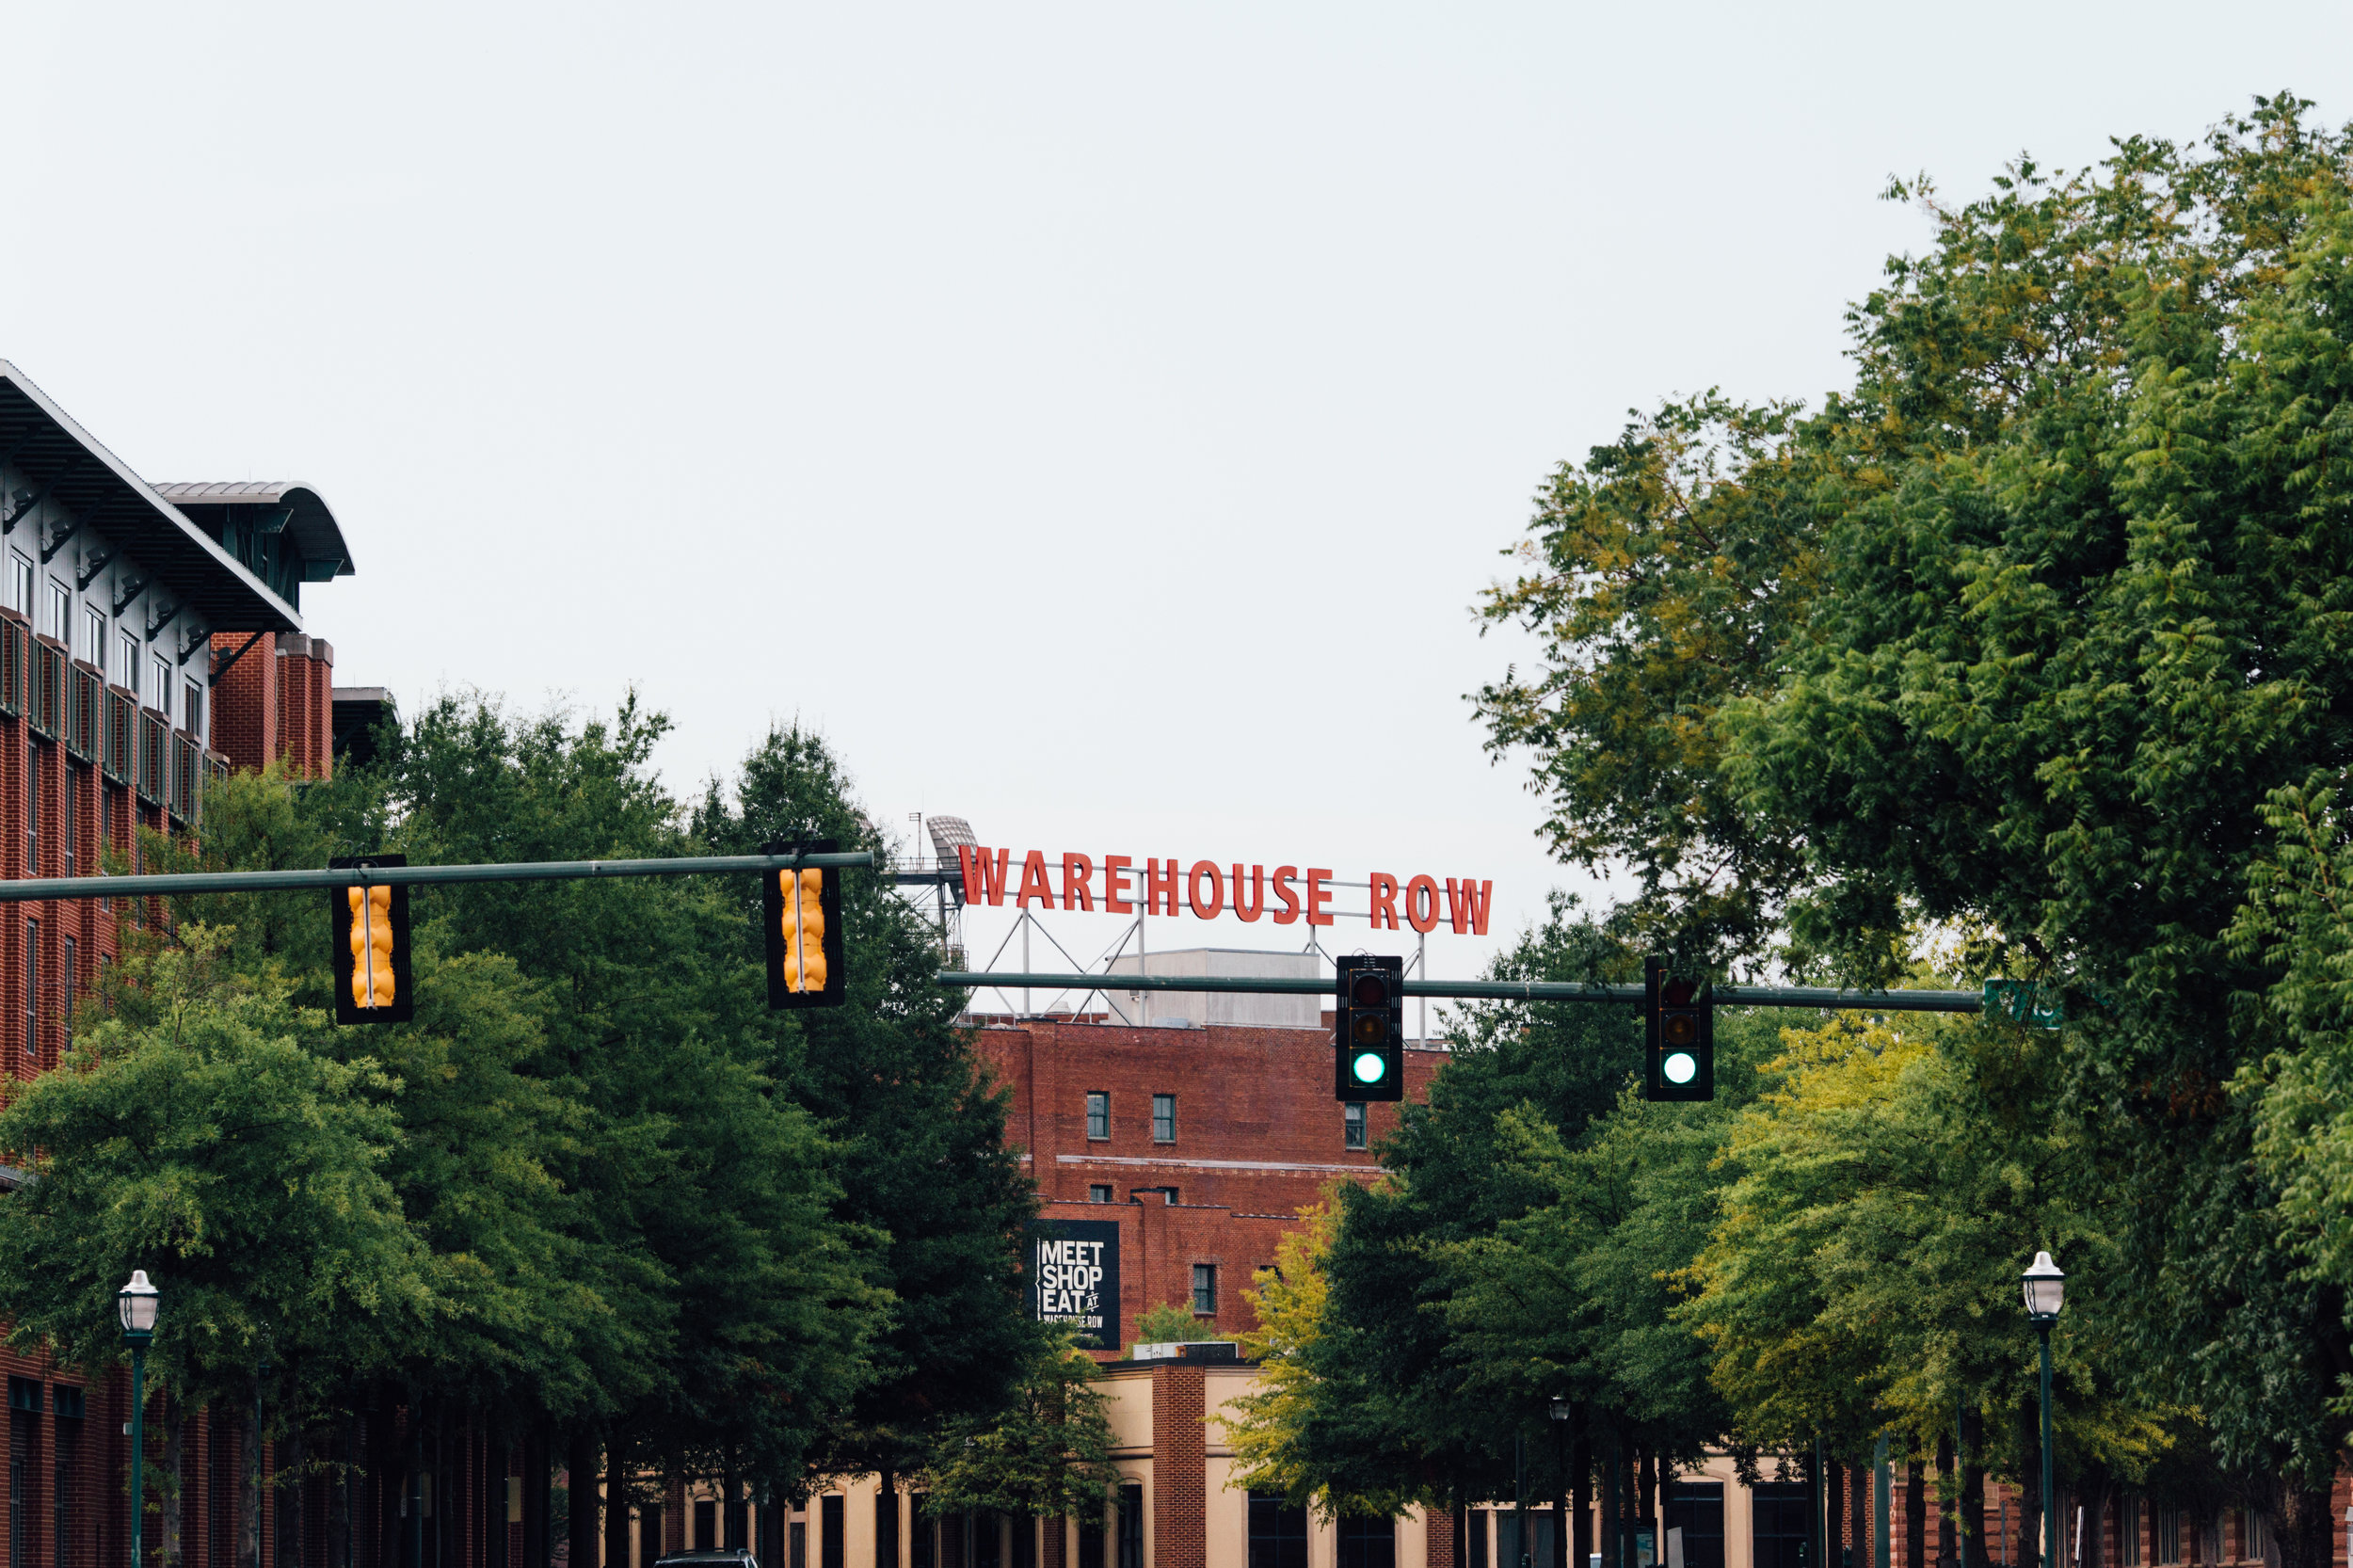 Chattanooga's Warehouse Row